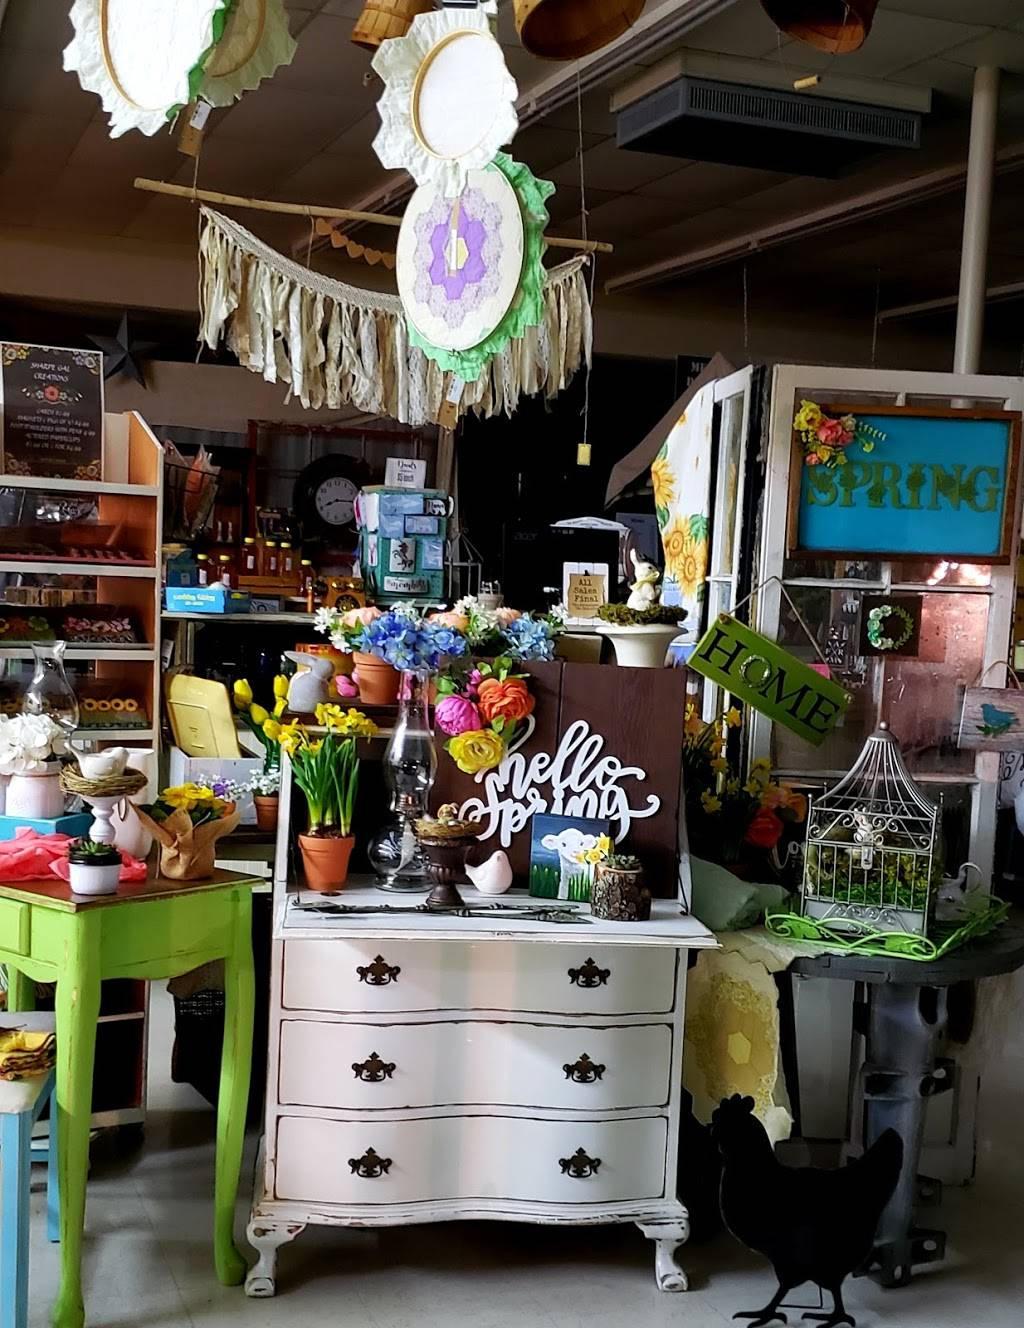 Center Street Junction - Mercantile and More   restaurant   101 Mashell Ave N, Eatonville, WA 98328, USA   3608322526 OR +1 360-832-2526